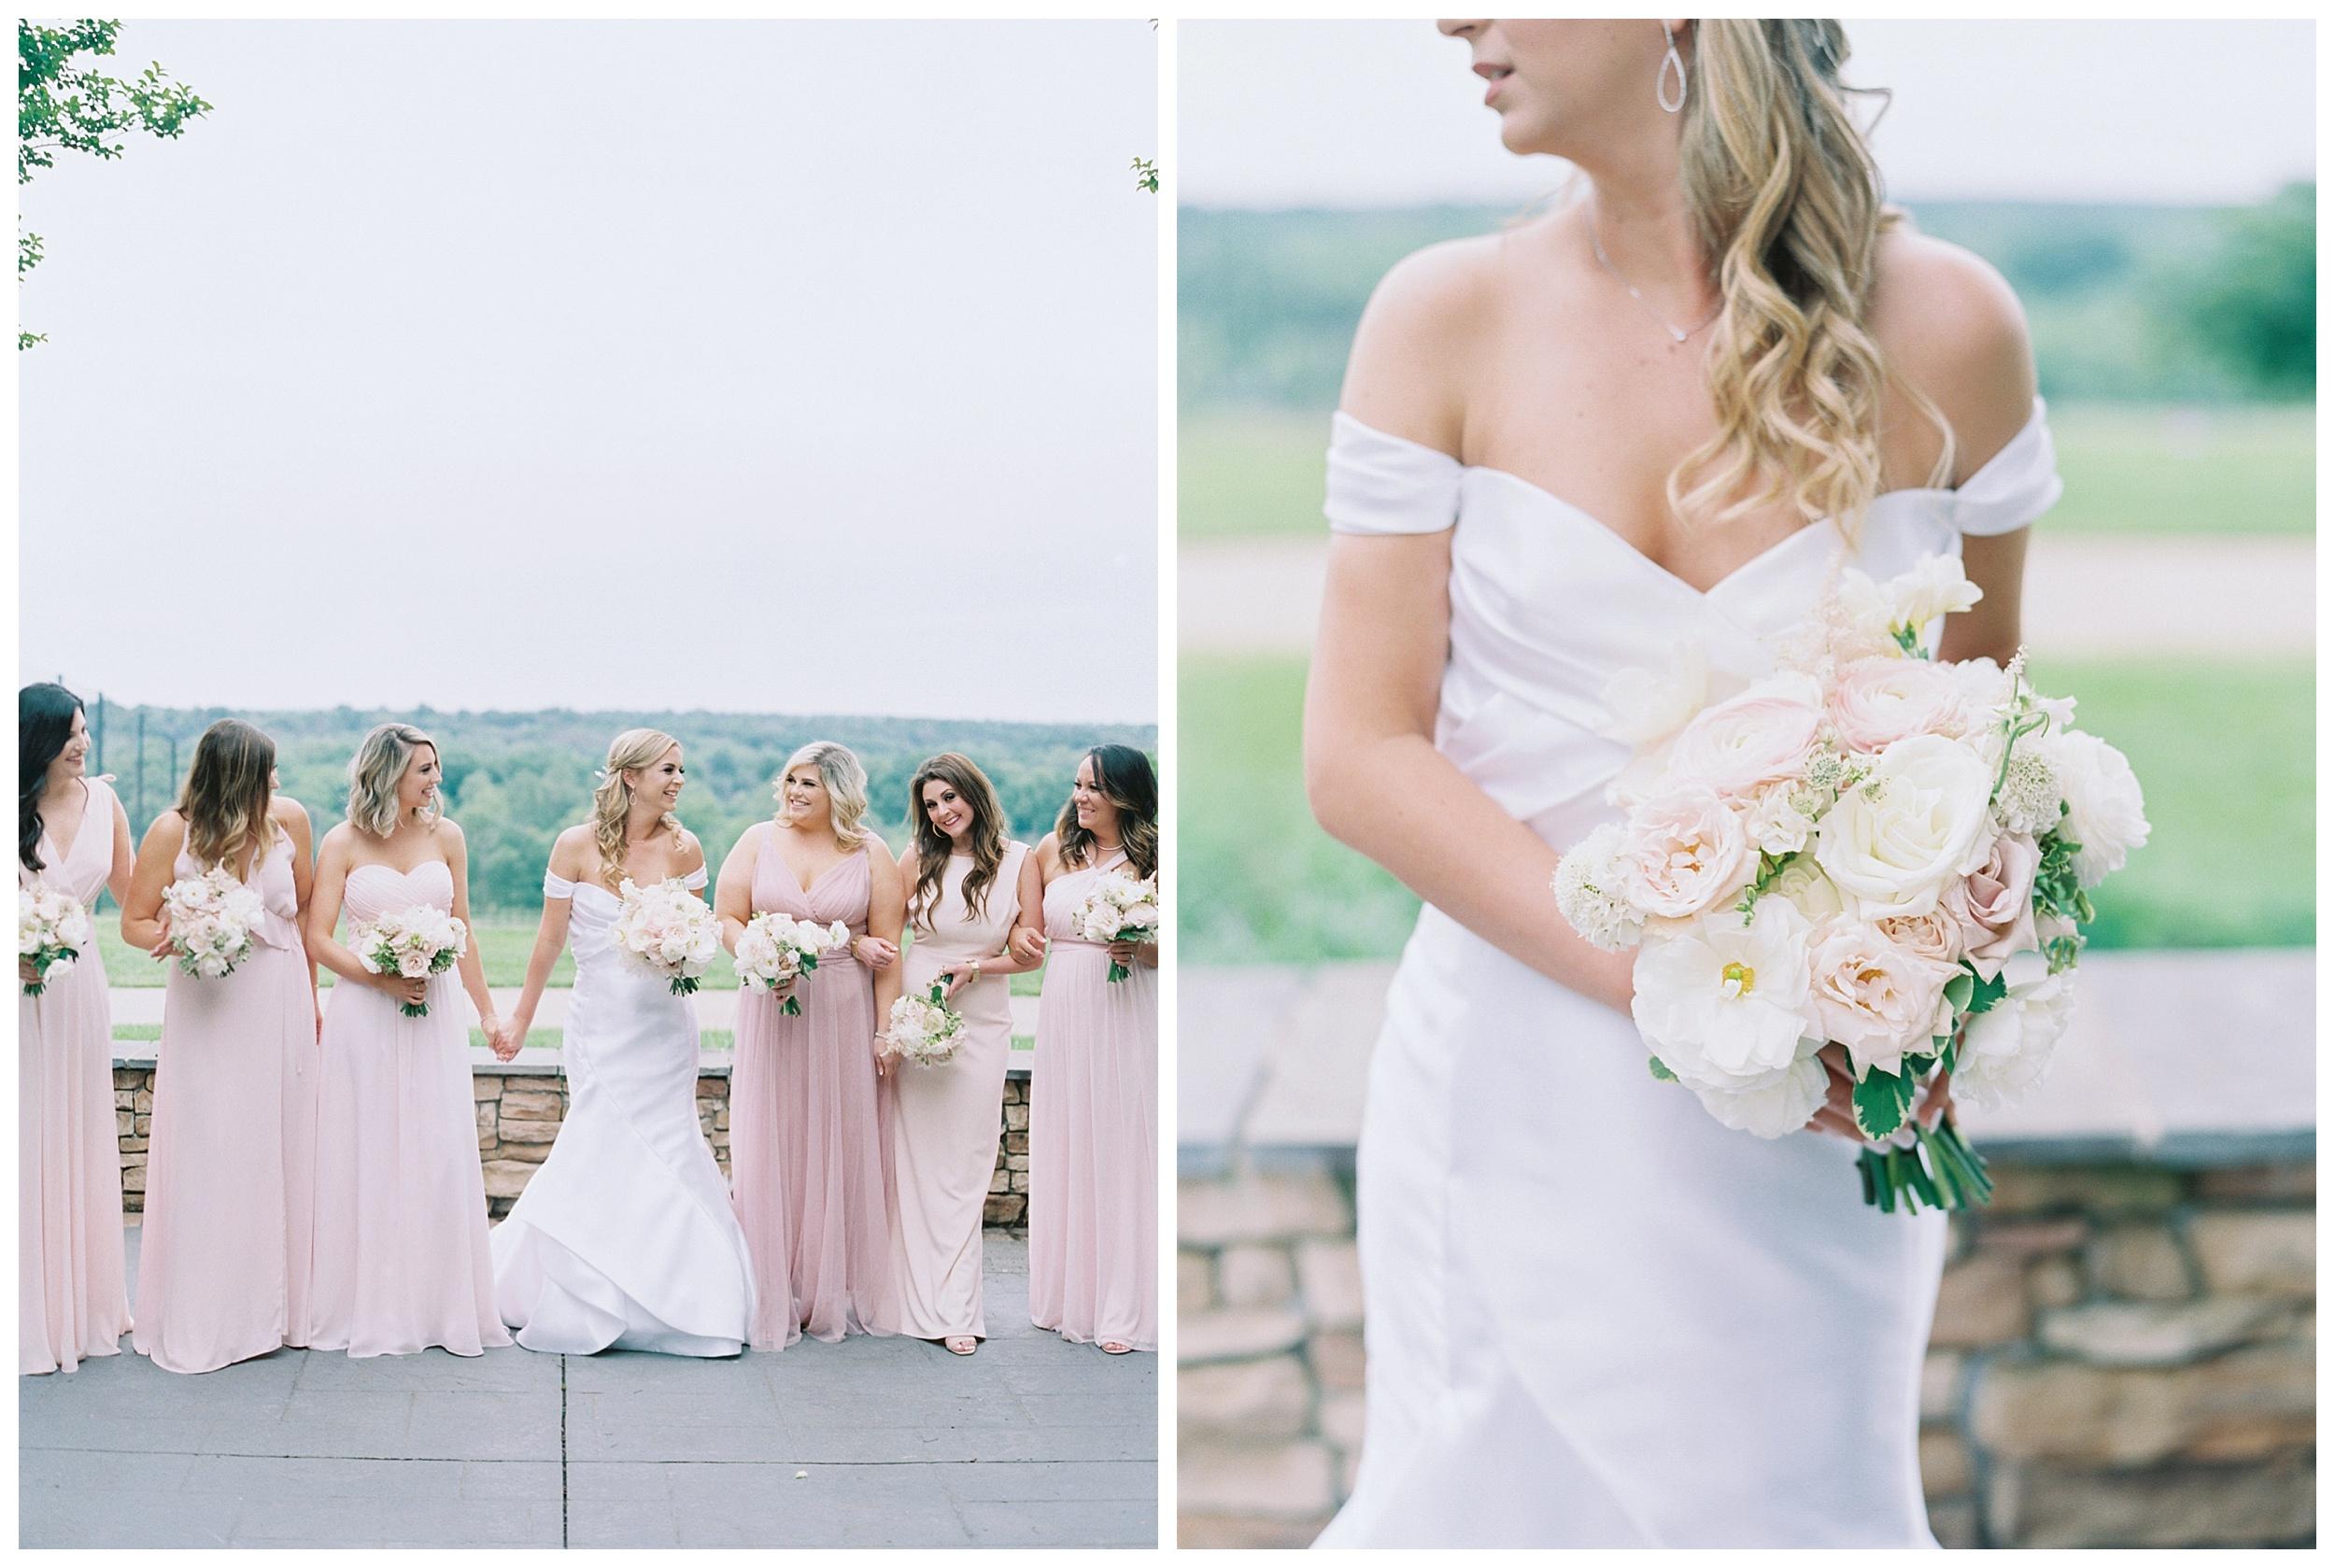 Lansdowne Resort Wedding | Virginia Film Wedding Photographer Kir Tuben_0029.jpg